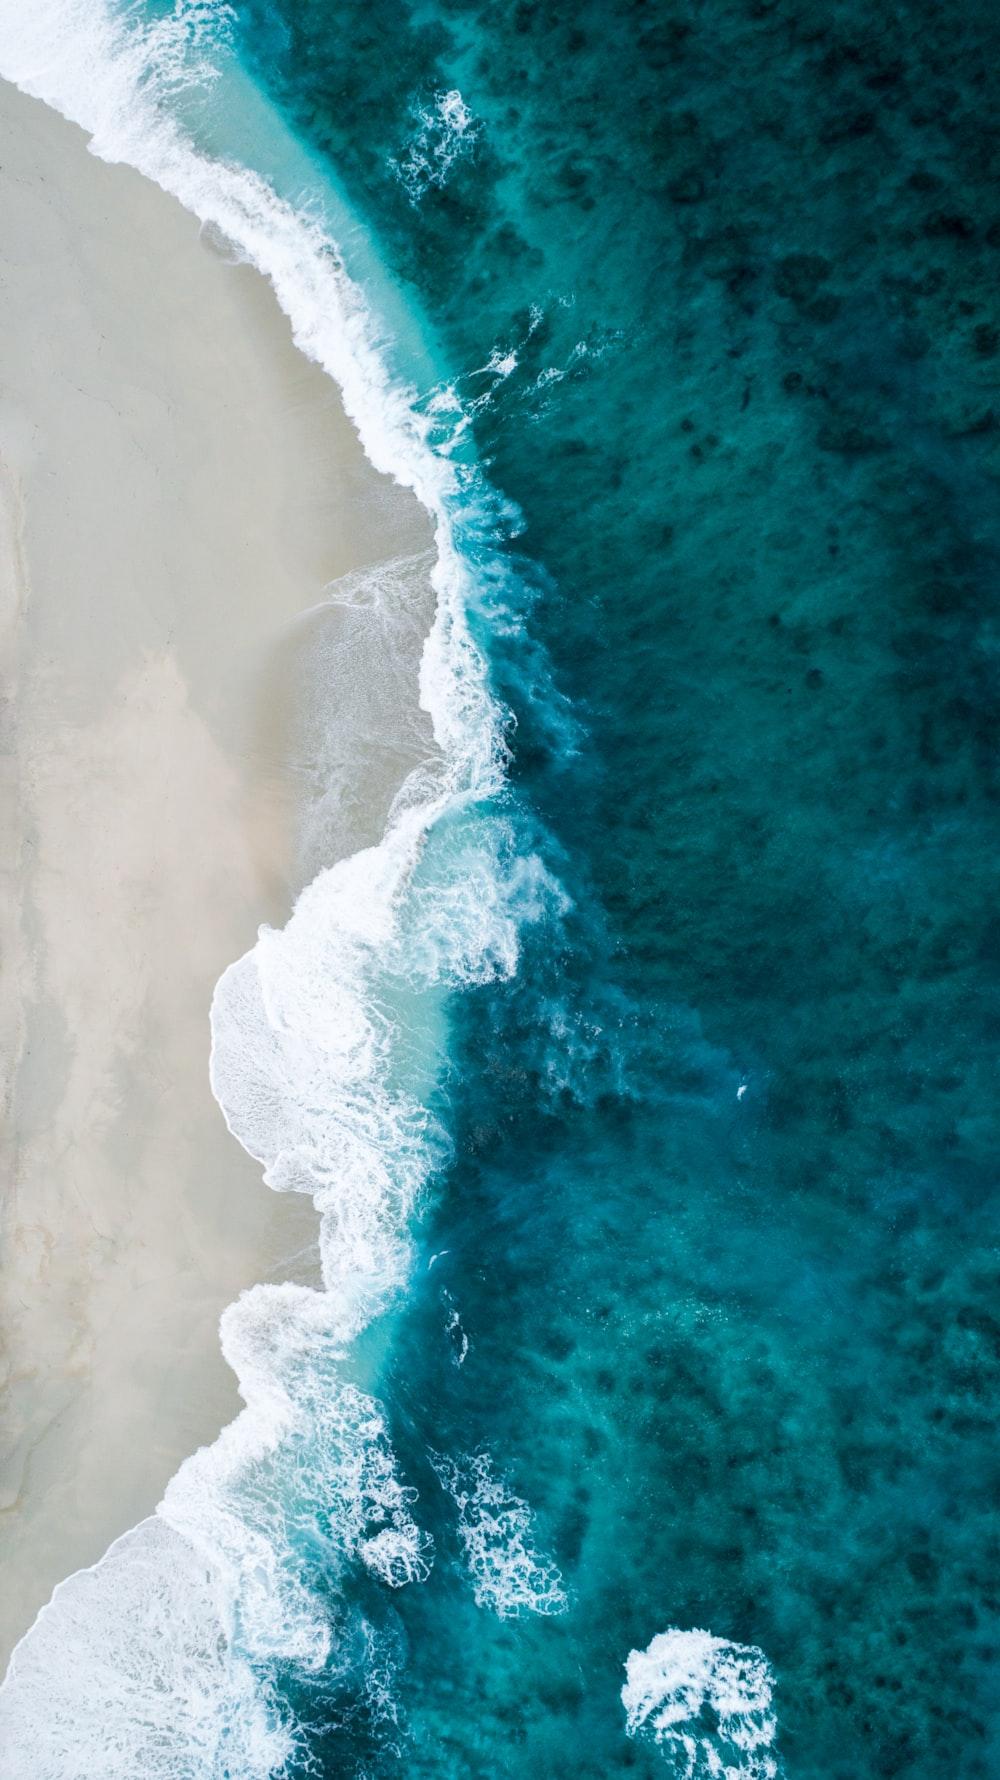 aerial photo of seashore